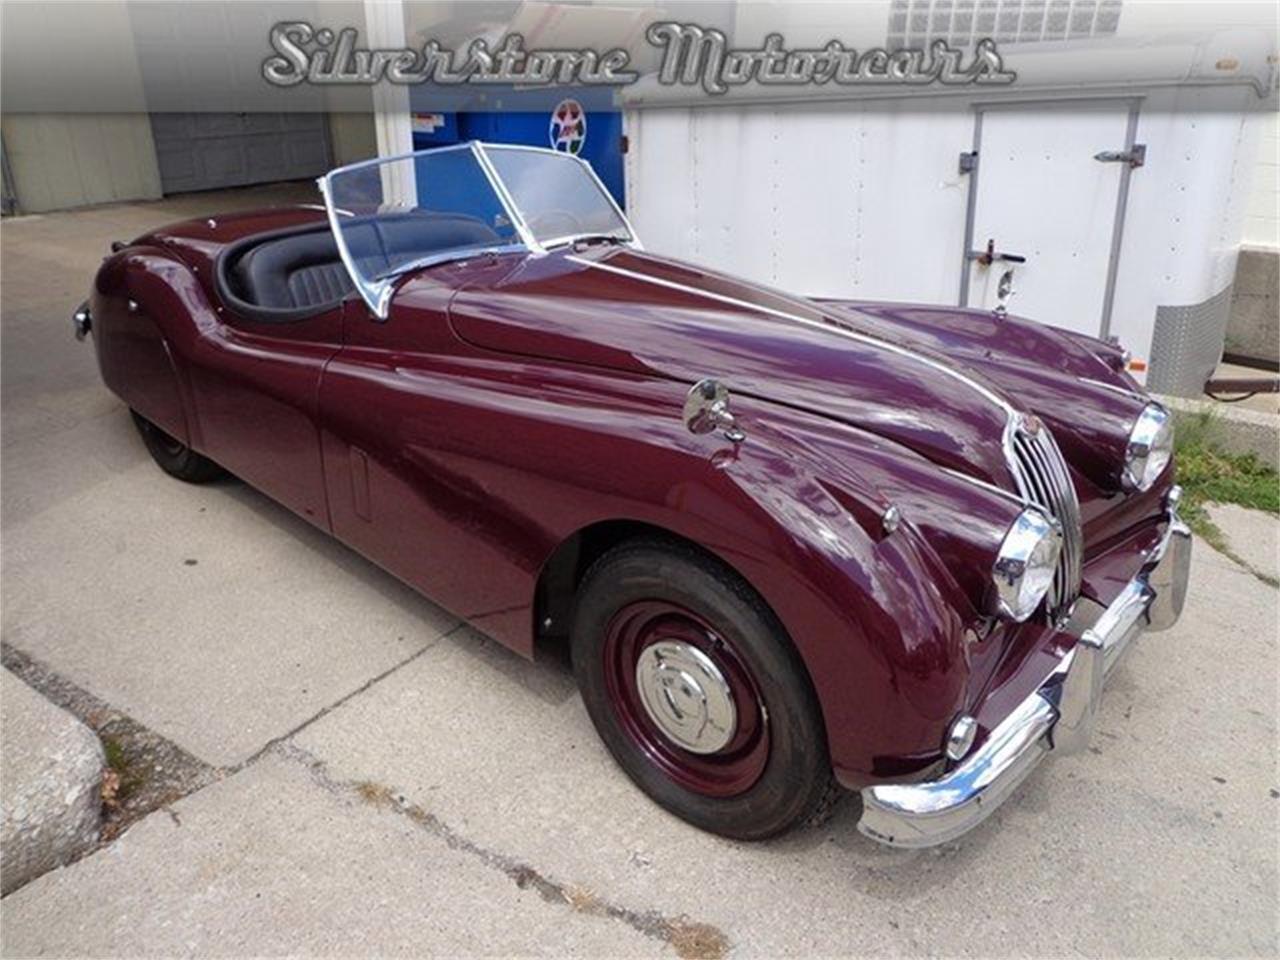 1955 Jaguar XK140 (CC-1180005) for sale in North Andover, Massachusetts